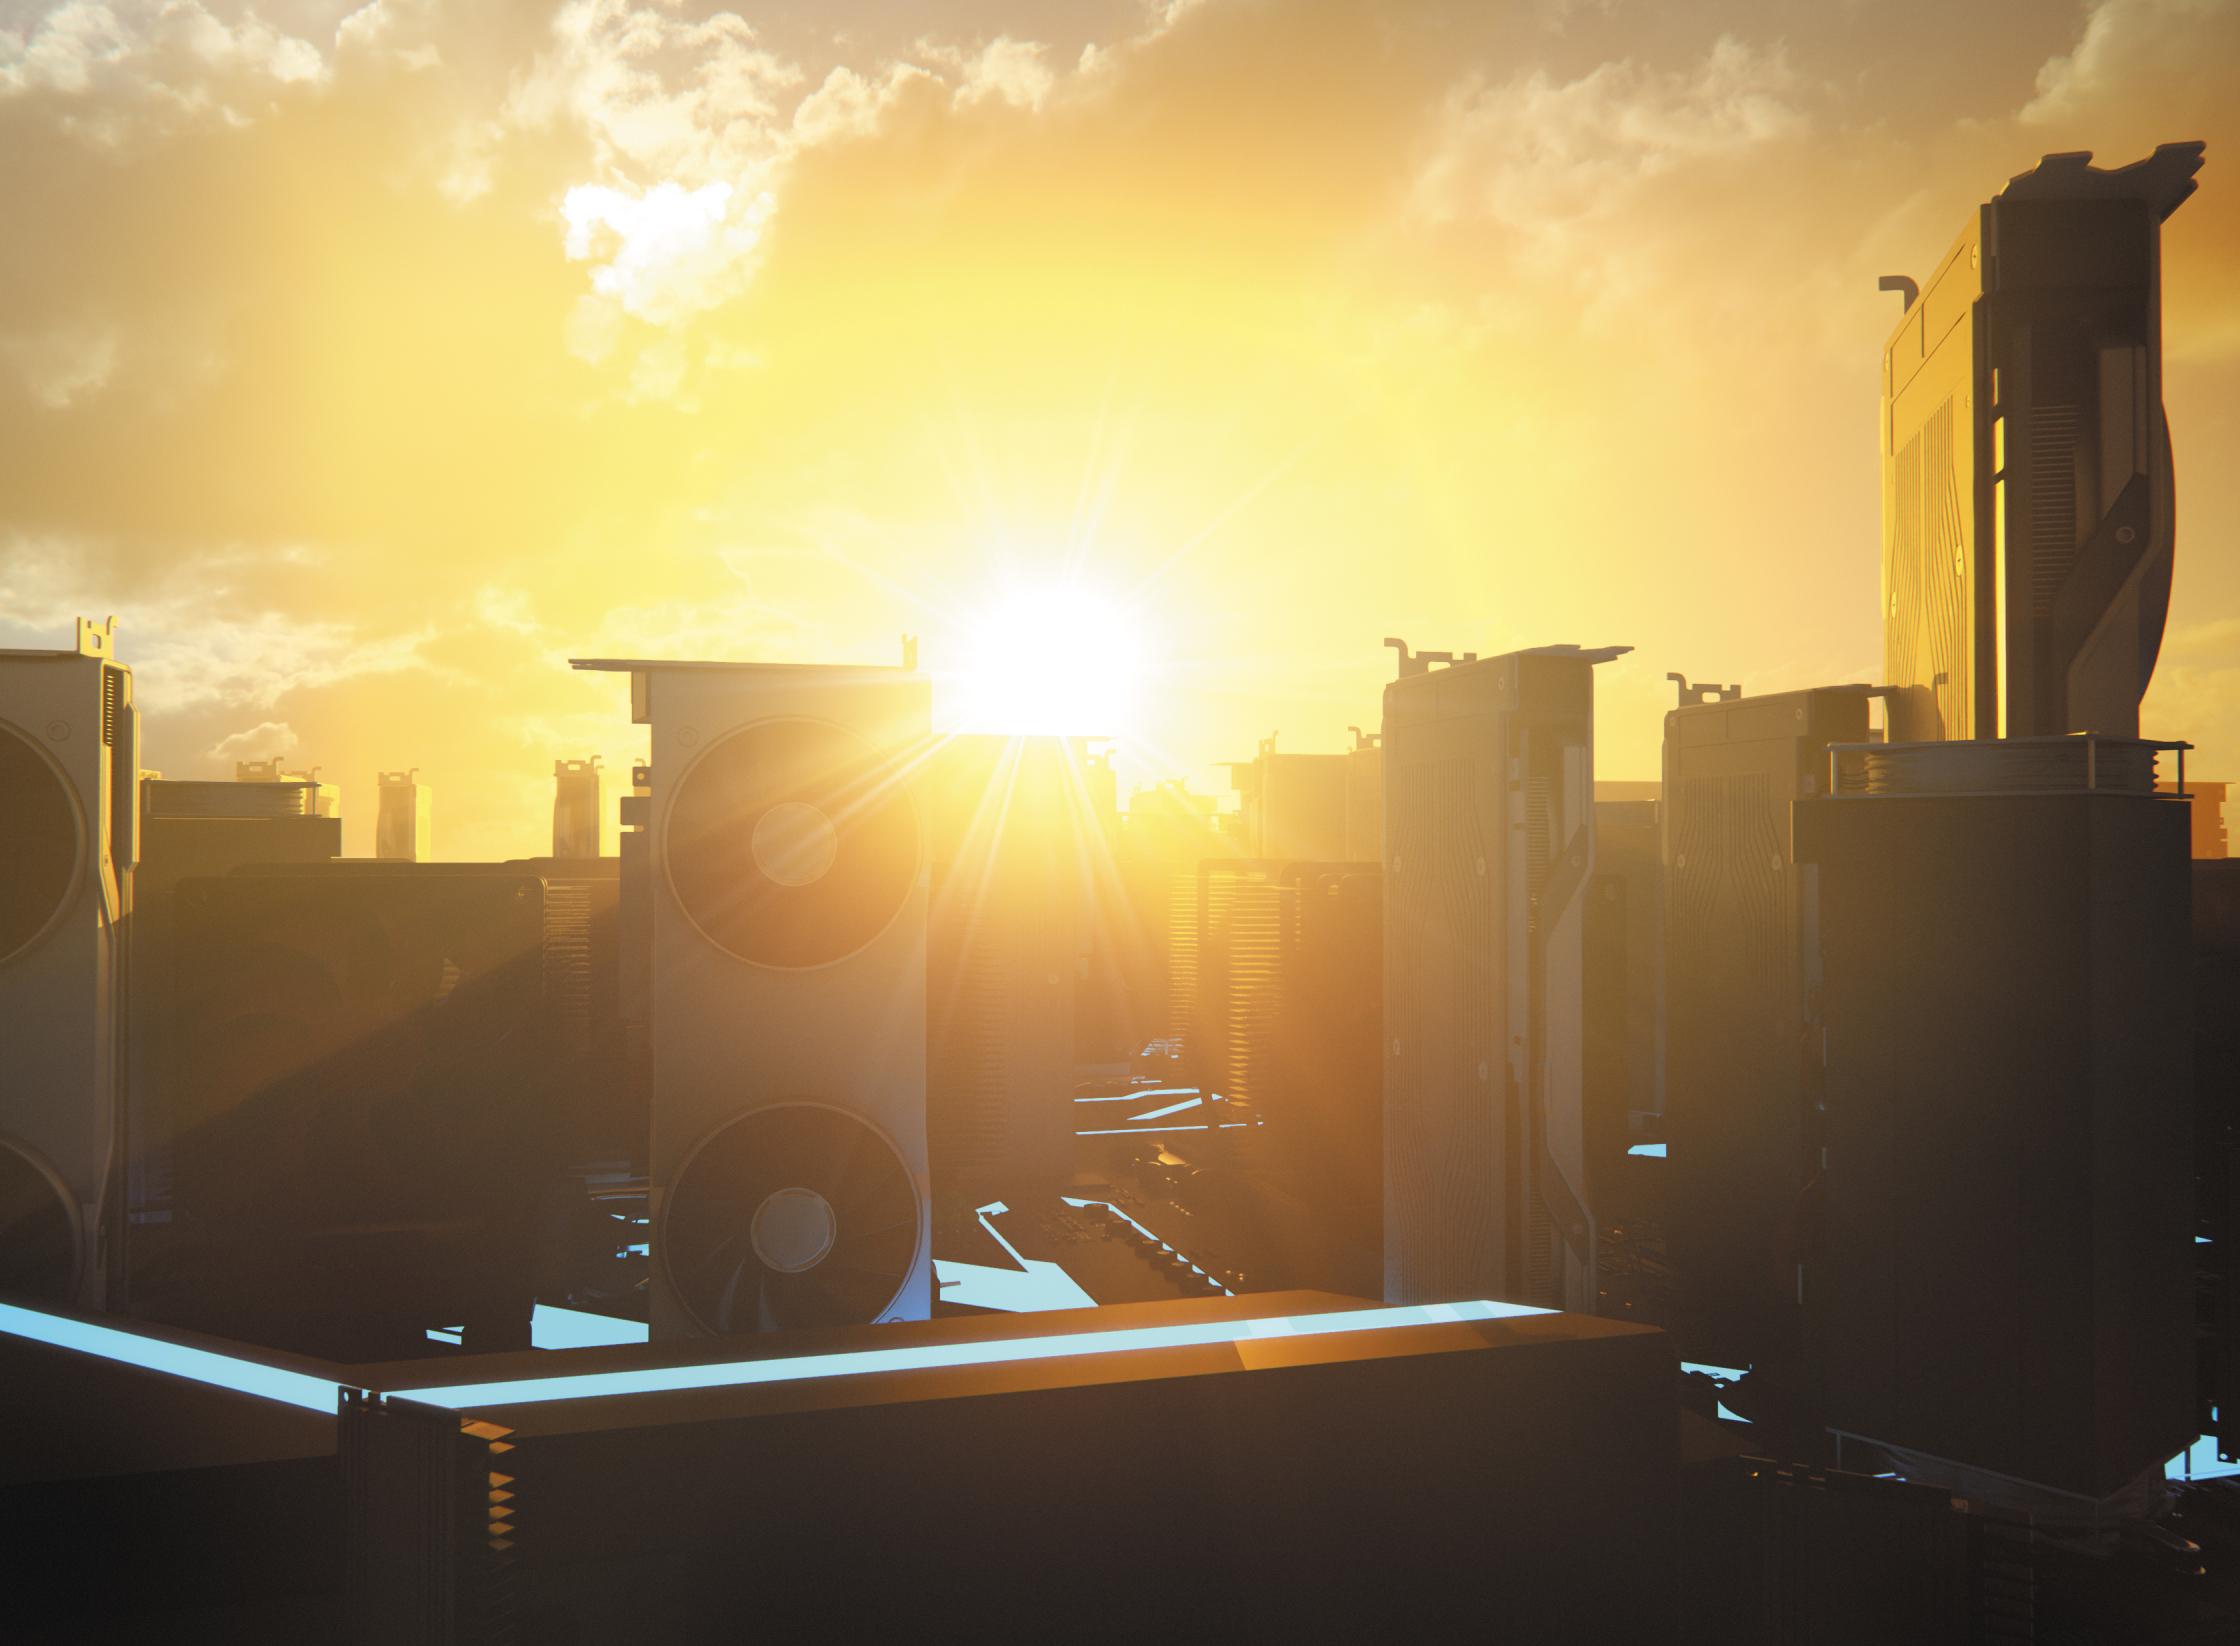 pcrowther_sun_circuit_city_CMYK.jpg